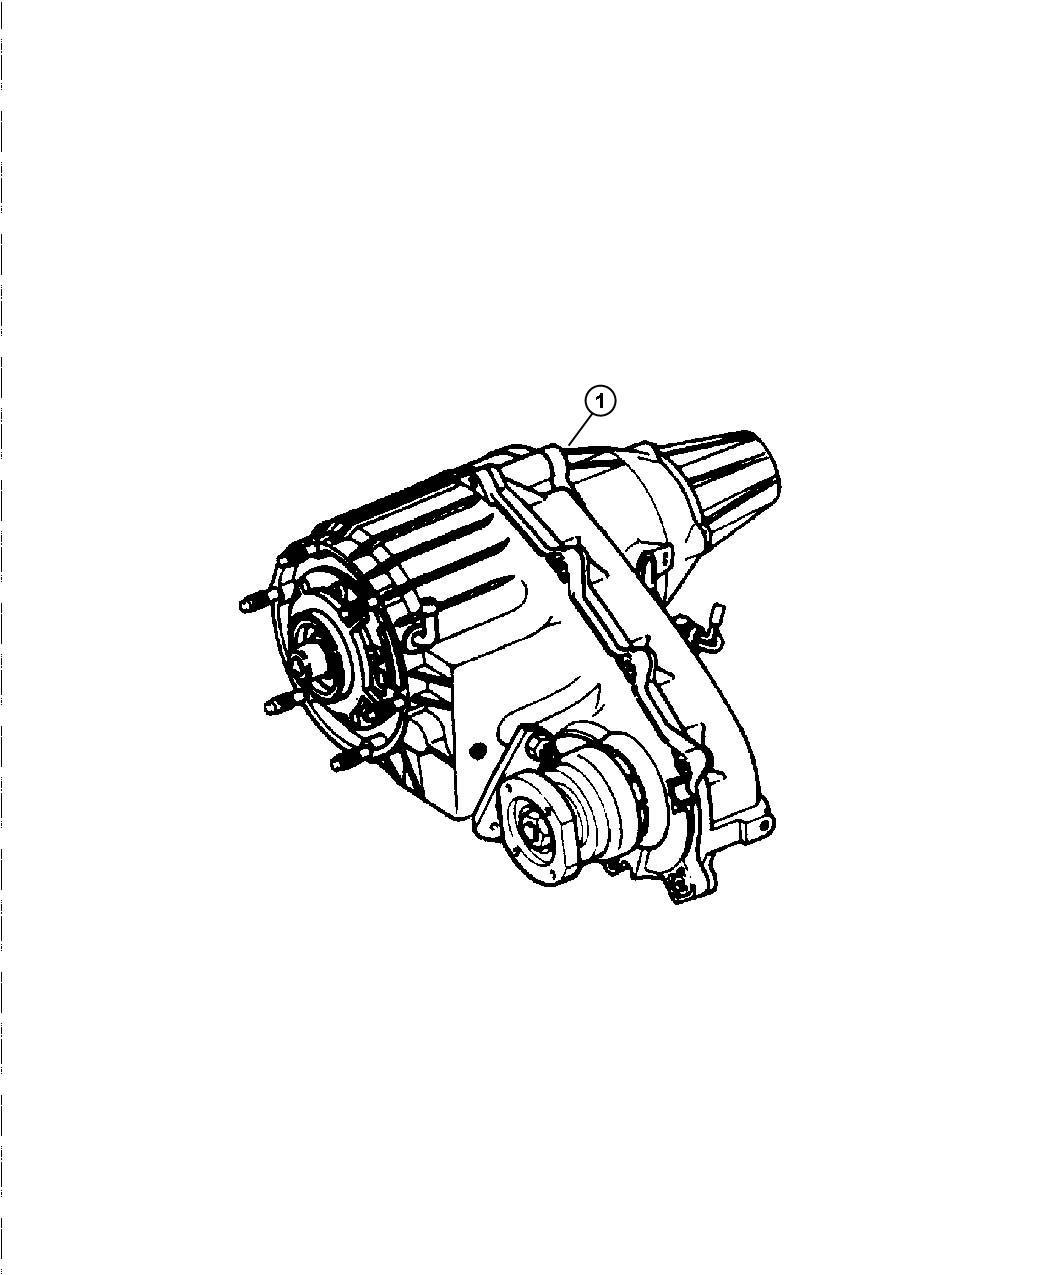 Chrysler Aspen Transfer case. Remanufactured. Time, fly